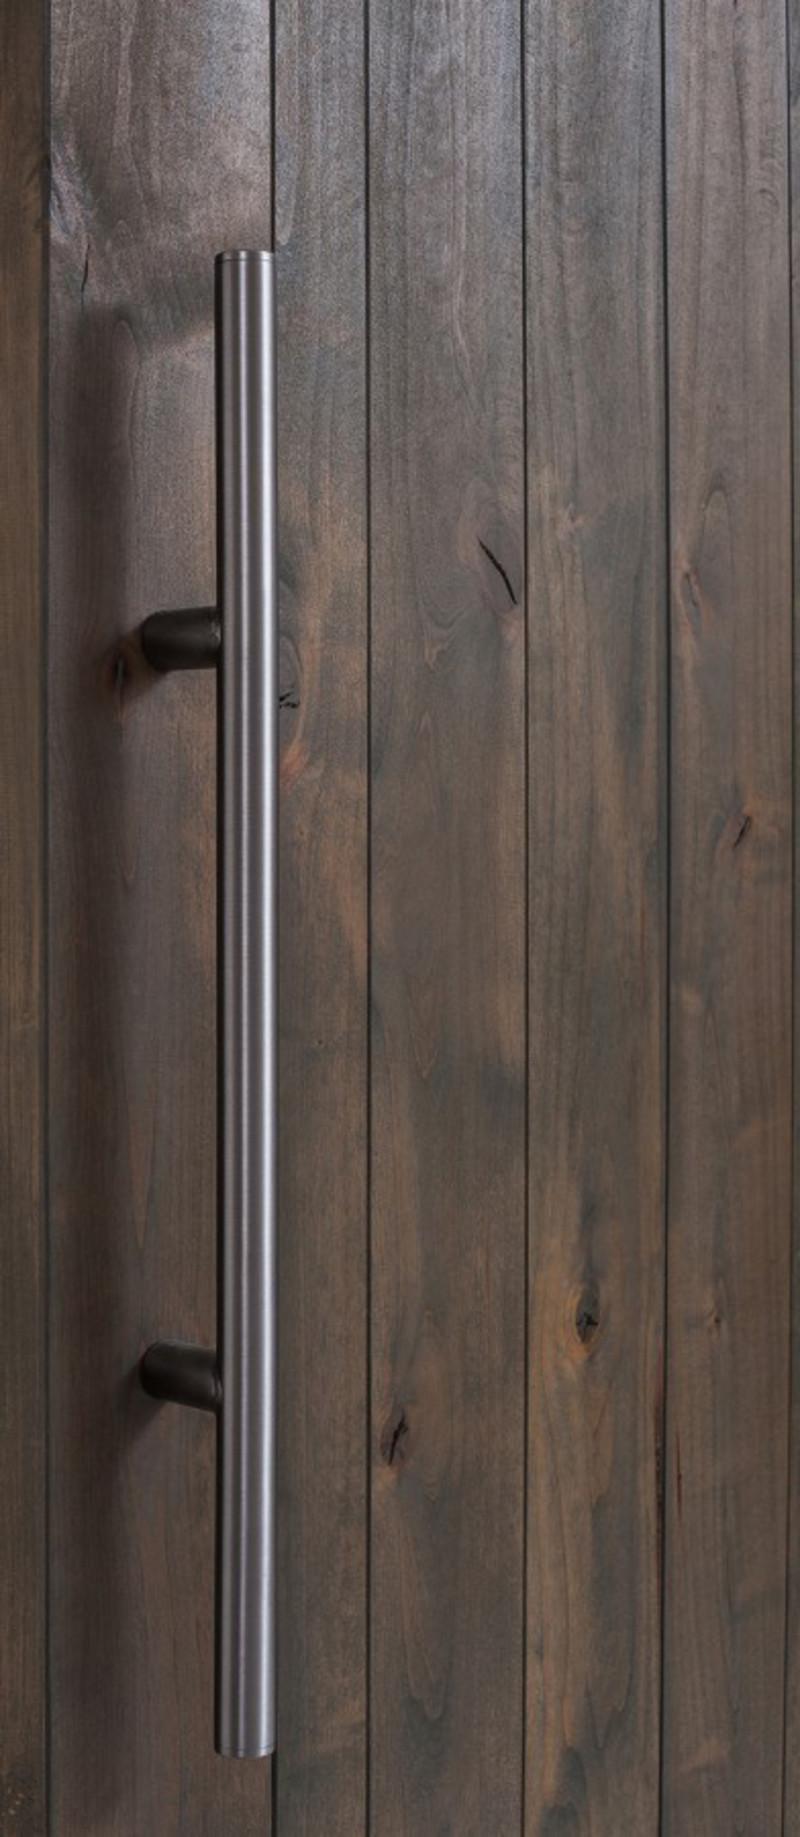 Modern Loft Sliding Barn Door Handle Rustica Hardware